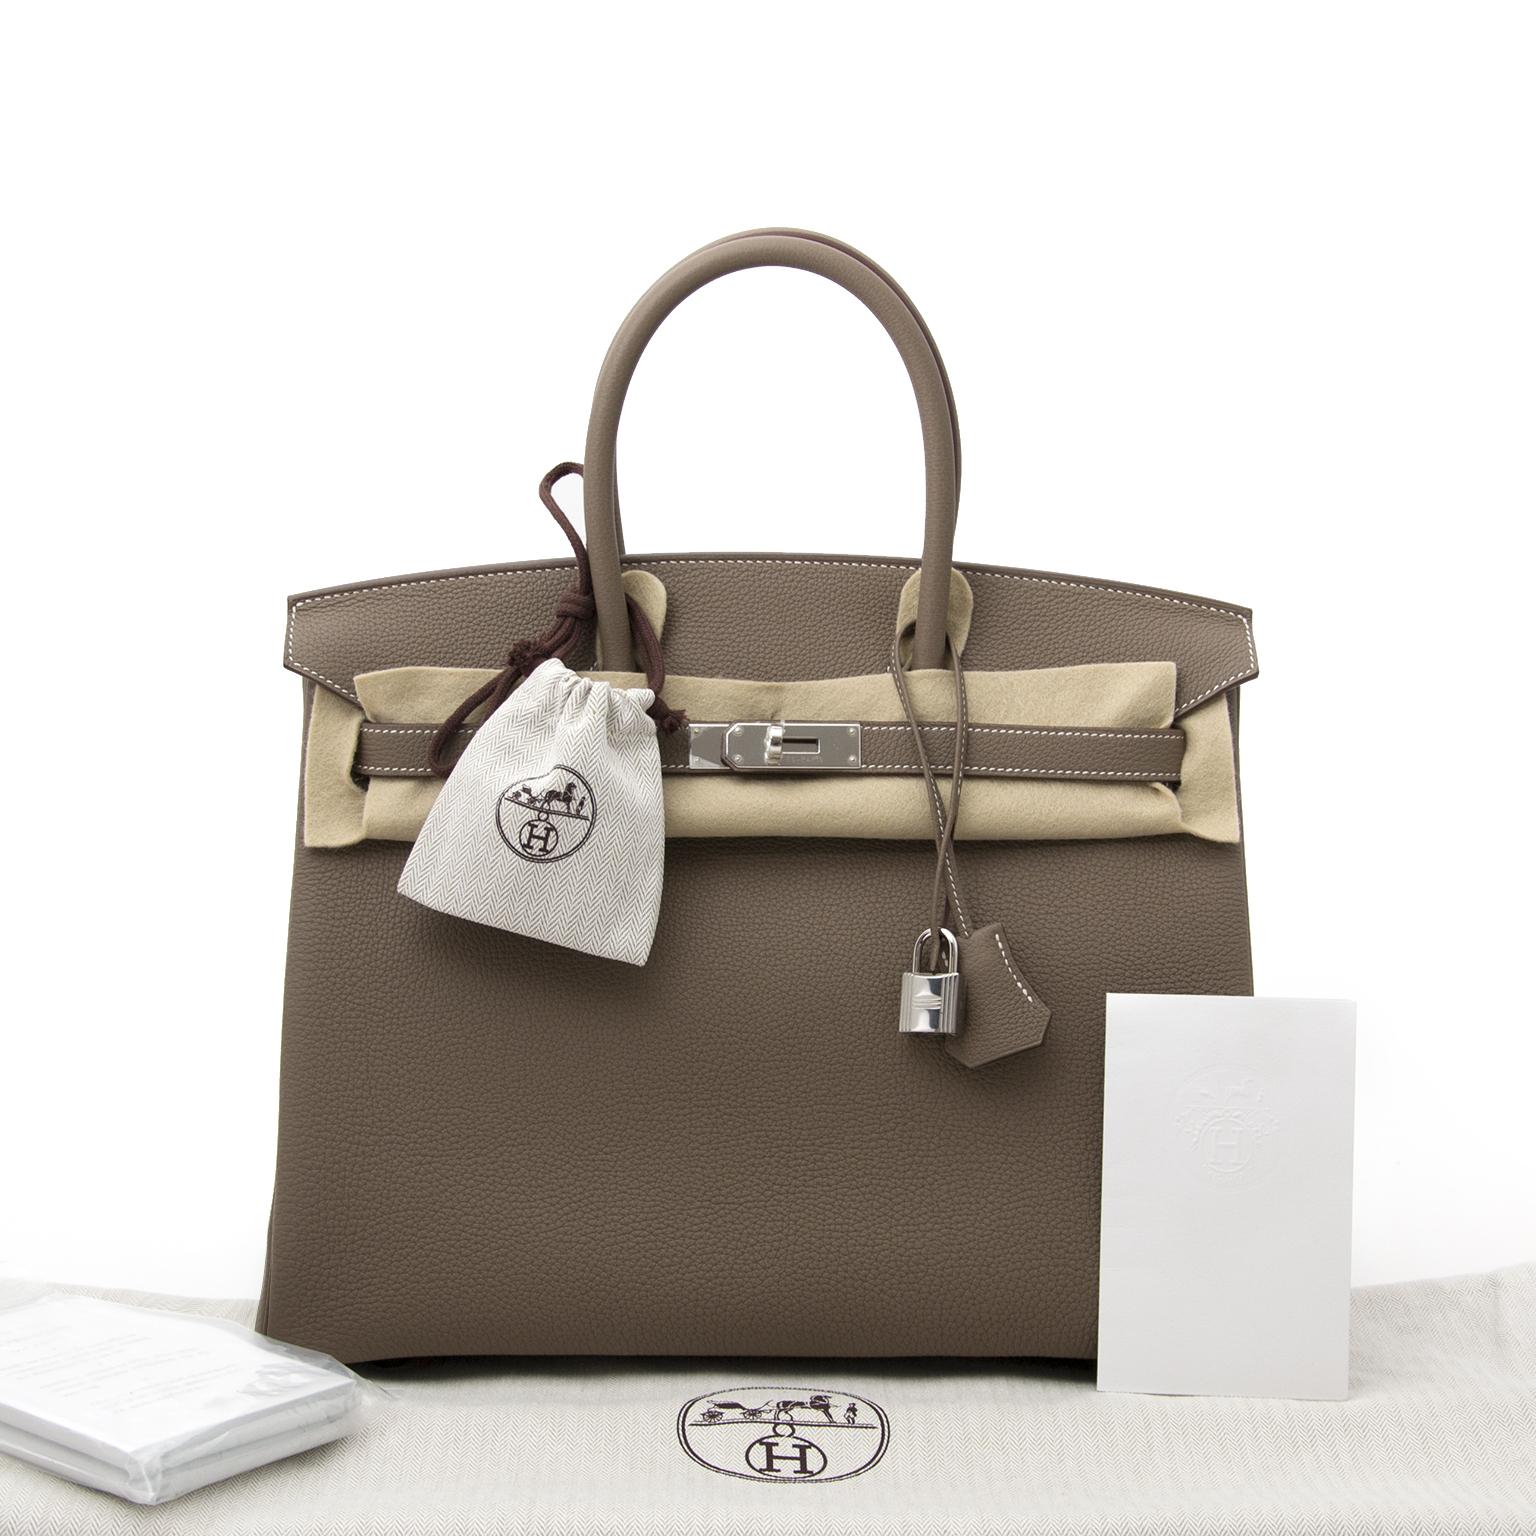 acheter enligne pour le meilleur prix neuf sac a main shop safe online at the best price secondhandBRAND NEW Hermes Birkin 35 etoupe PHW togo